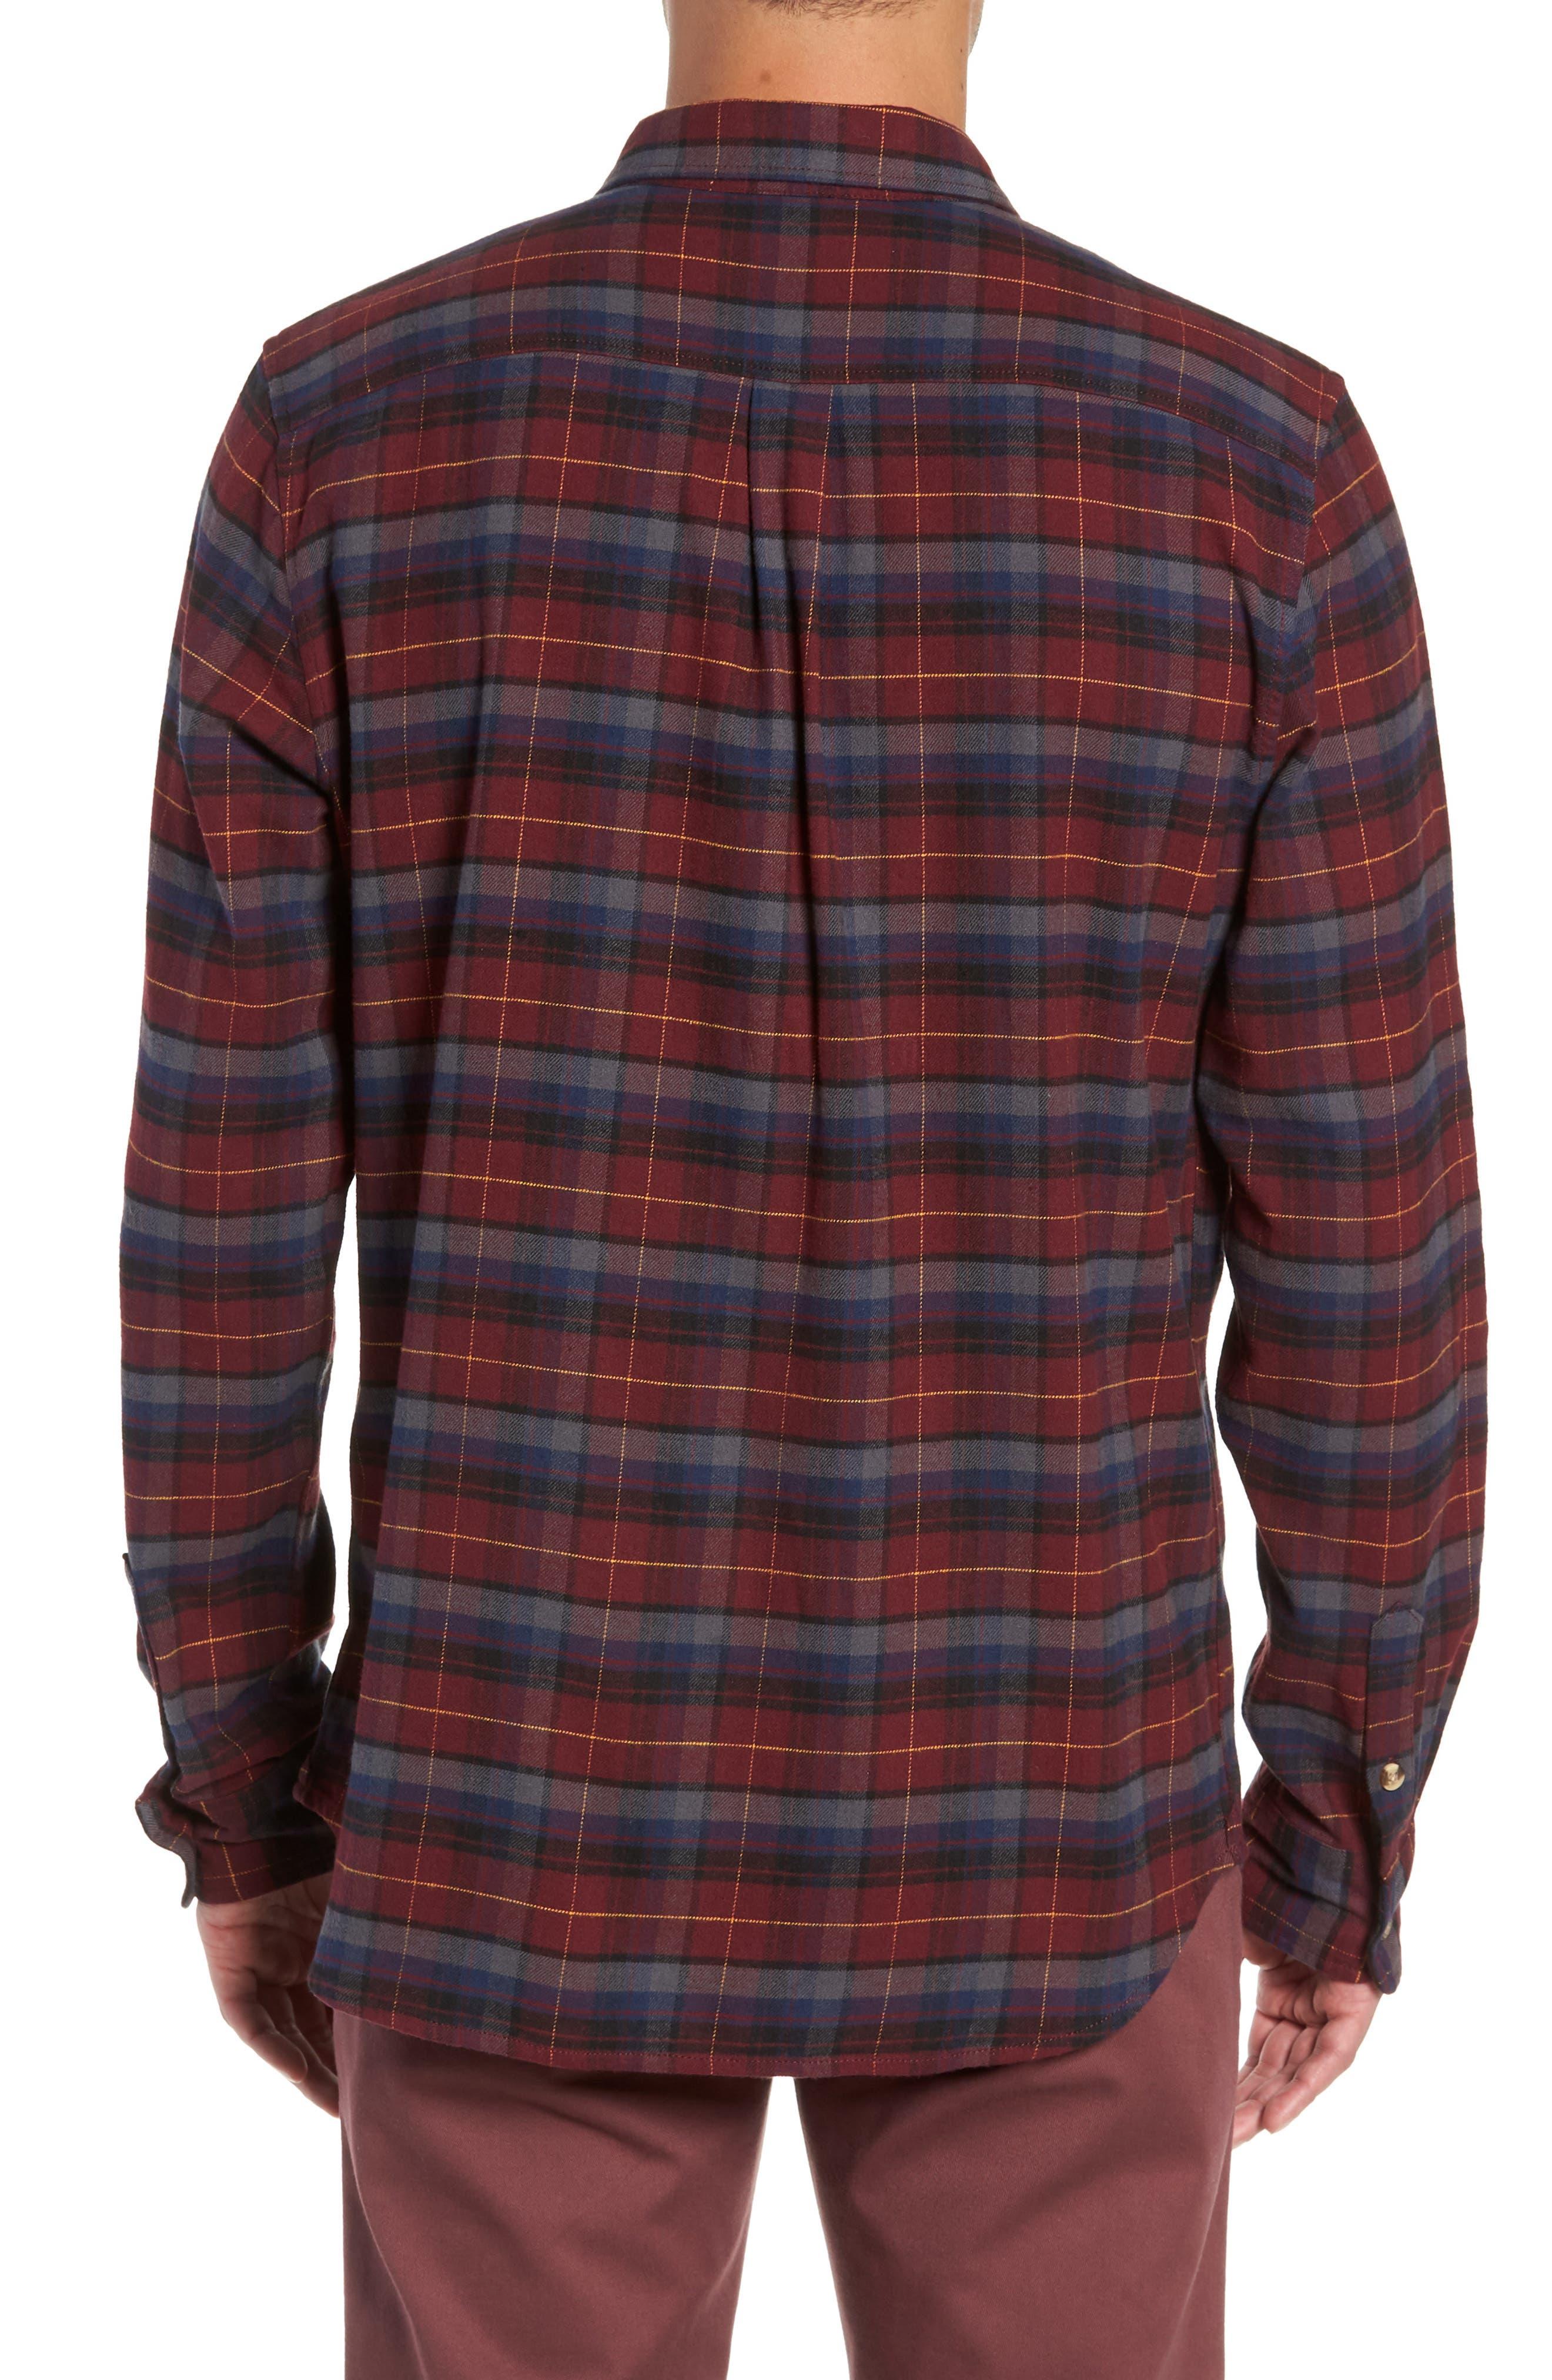 Banfield III Plaid Flannel Shirt,                             Alternate thumbnail 3, color,                             930